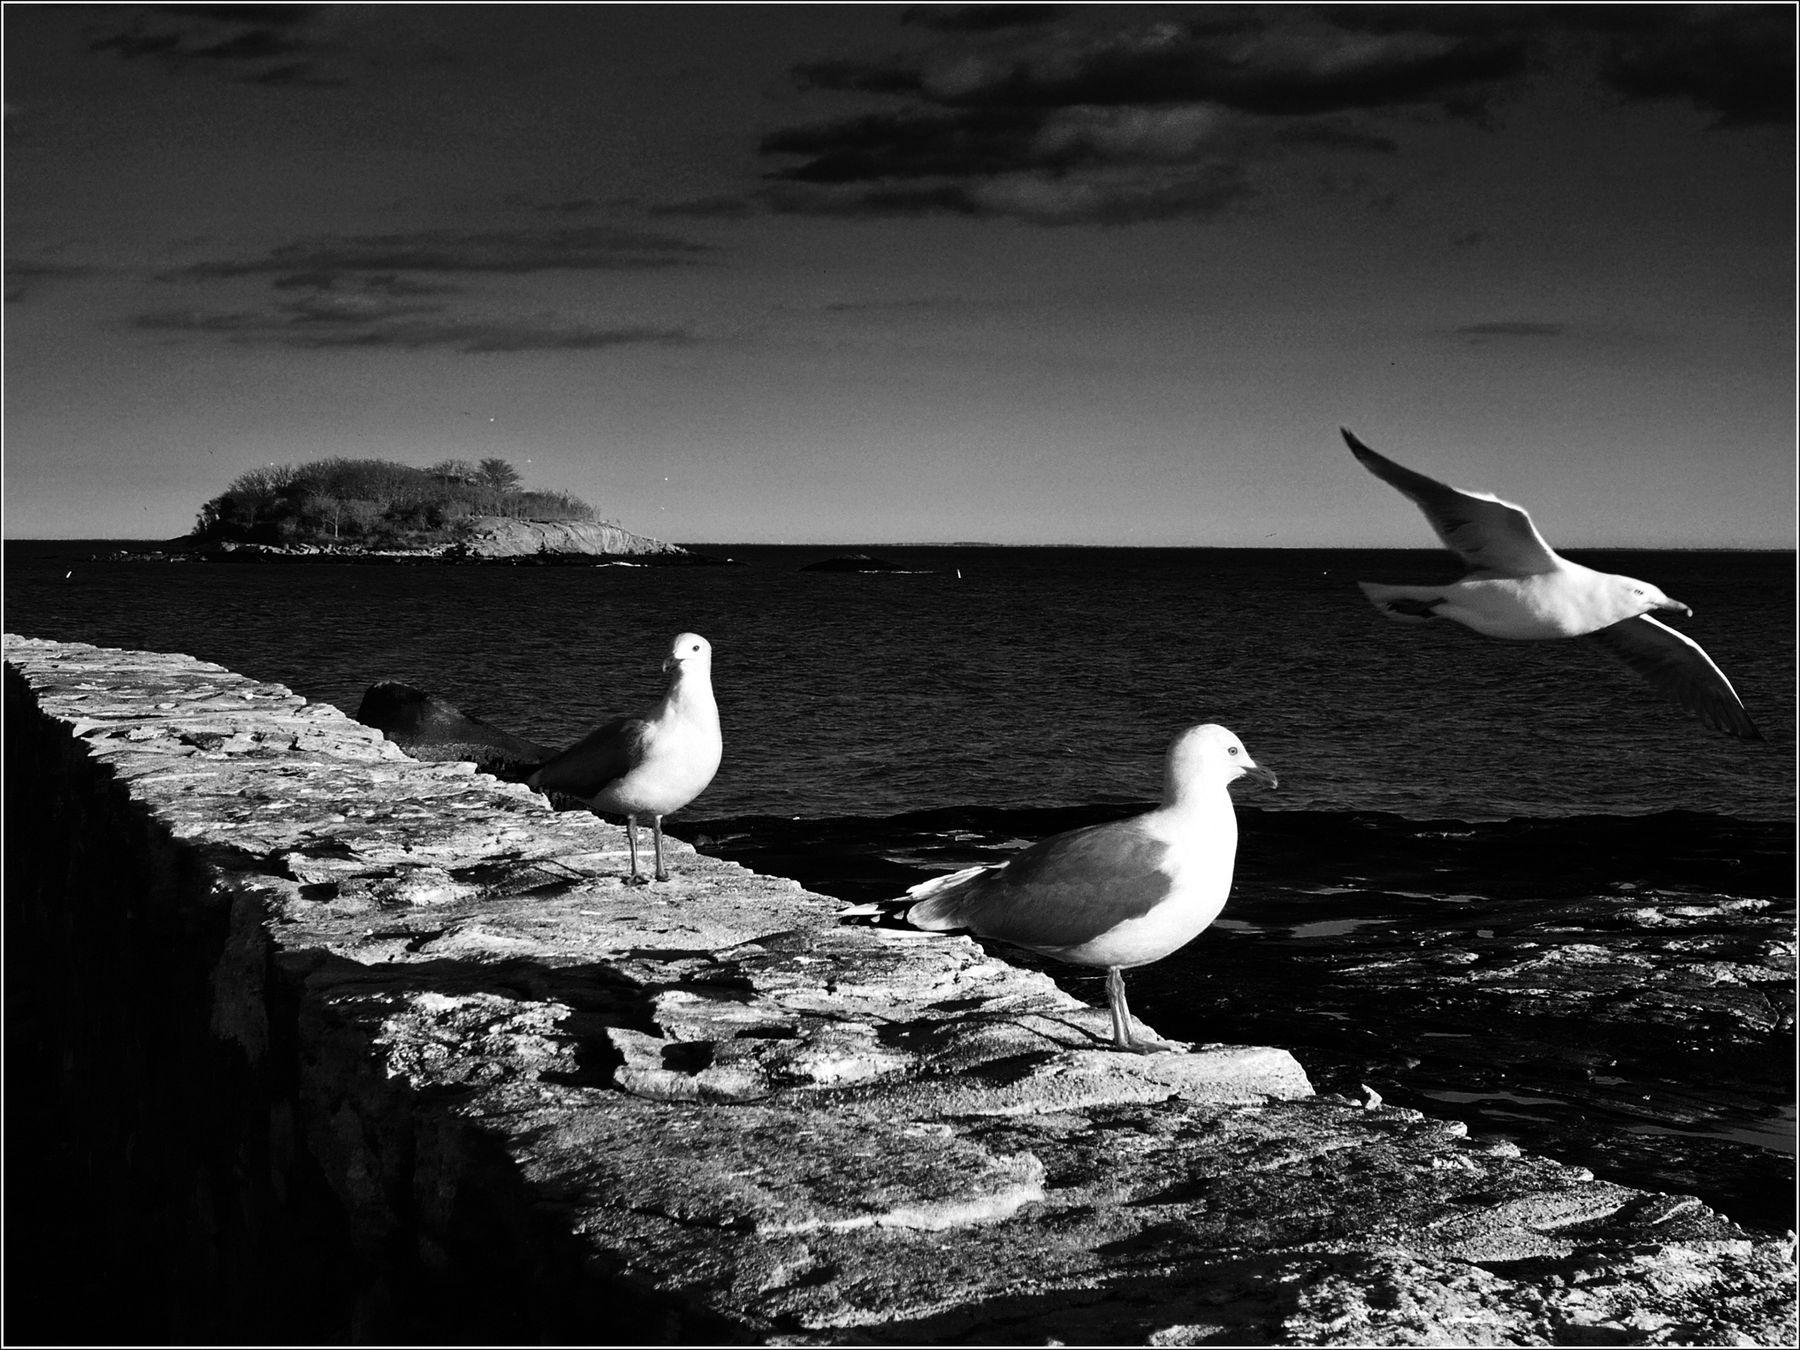 *Чайки Атлантического океана* фотография путешествия Атлантика США берег море чайки весна Коннектикут птицы Фото.Сайт Светлана Мамакина Lihgra Adventure